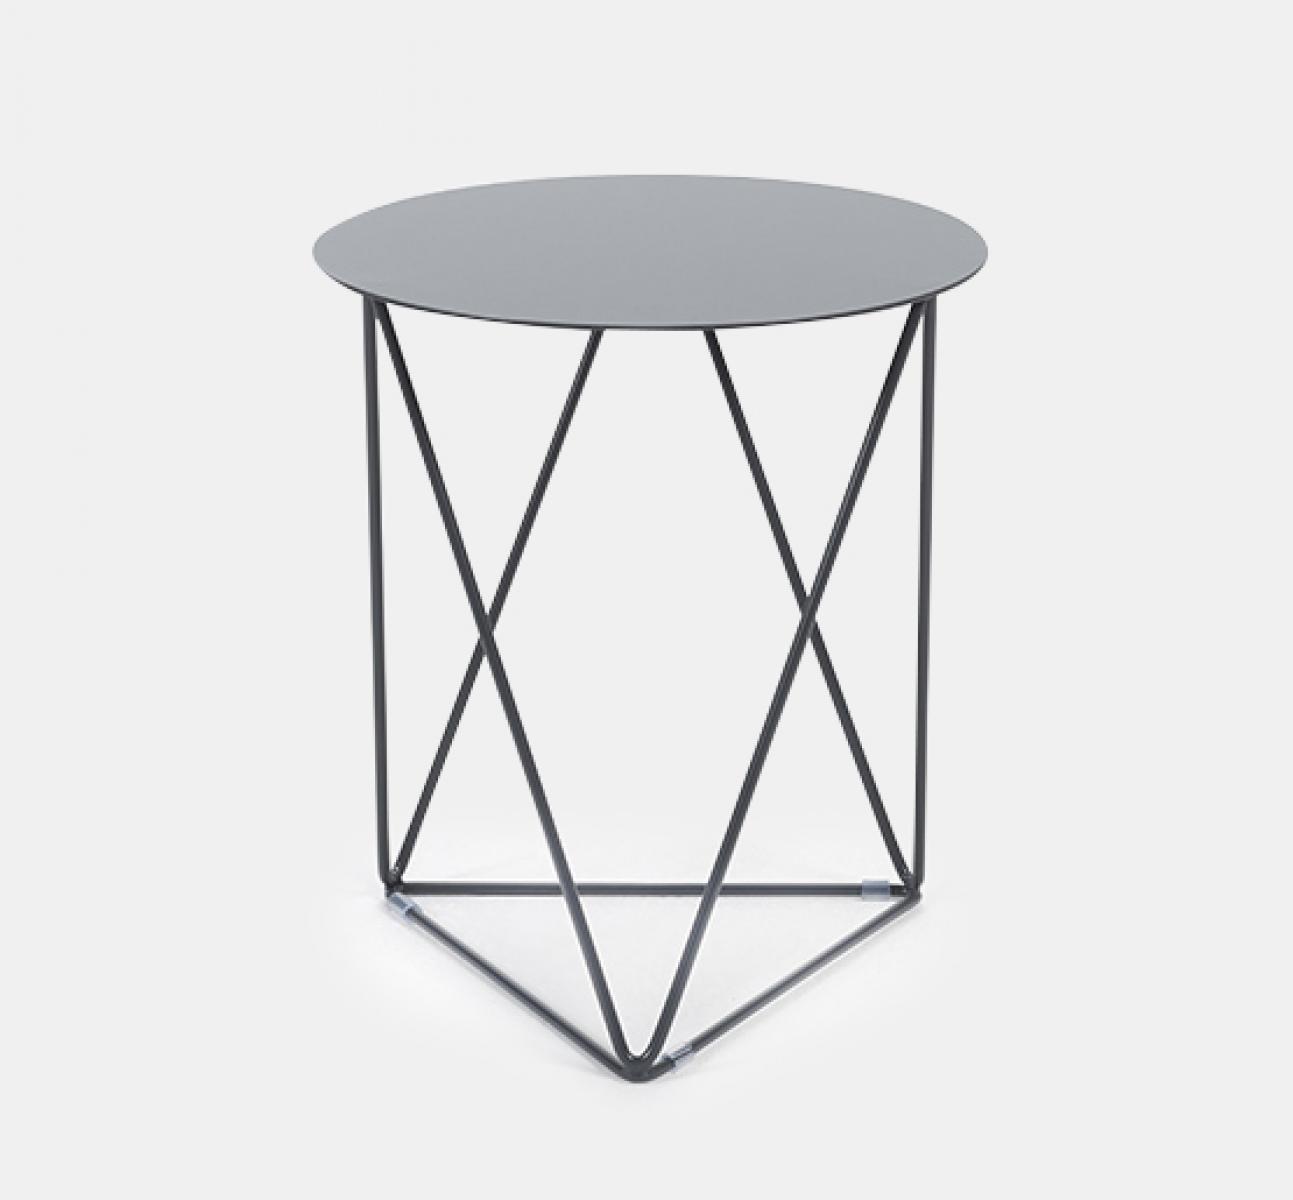 Geo Coffee Table - Grey